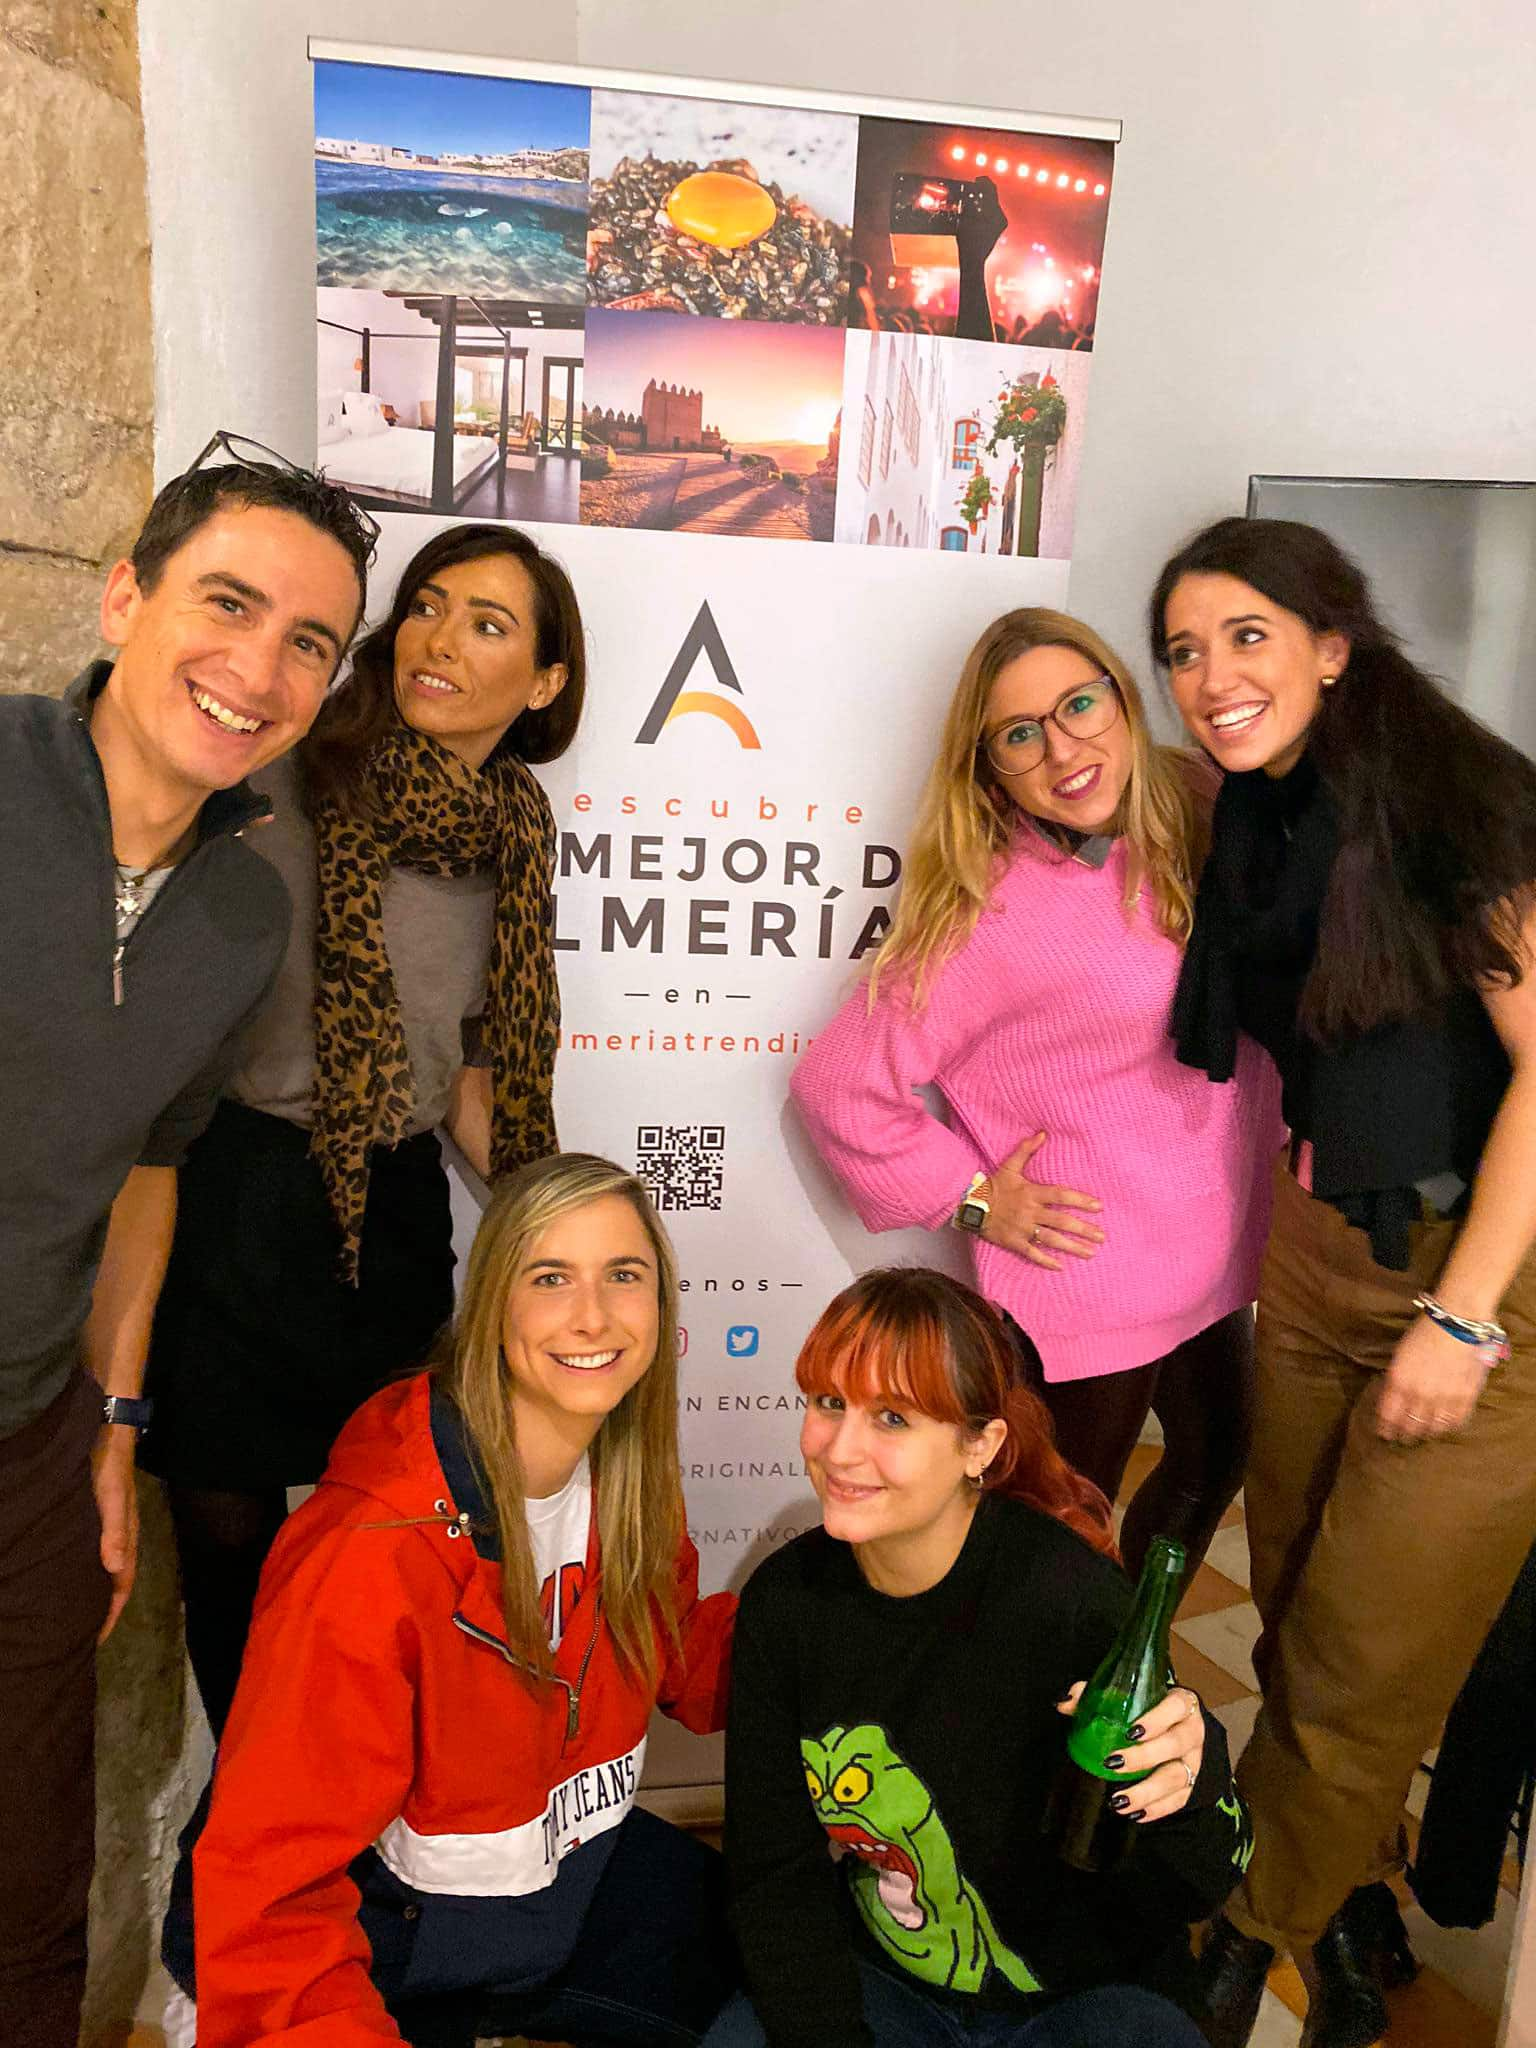 Almeria-Trending-Embajadores